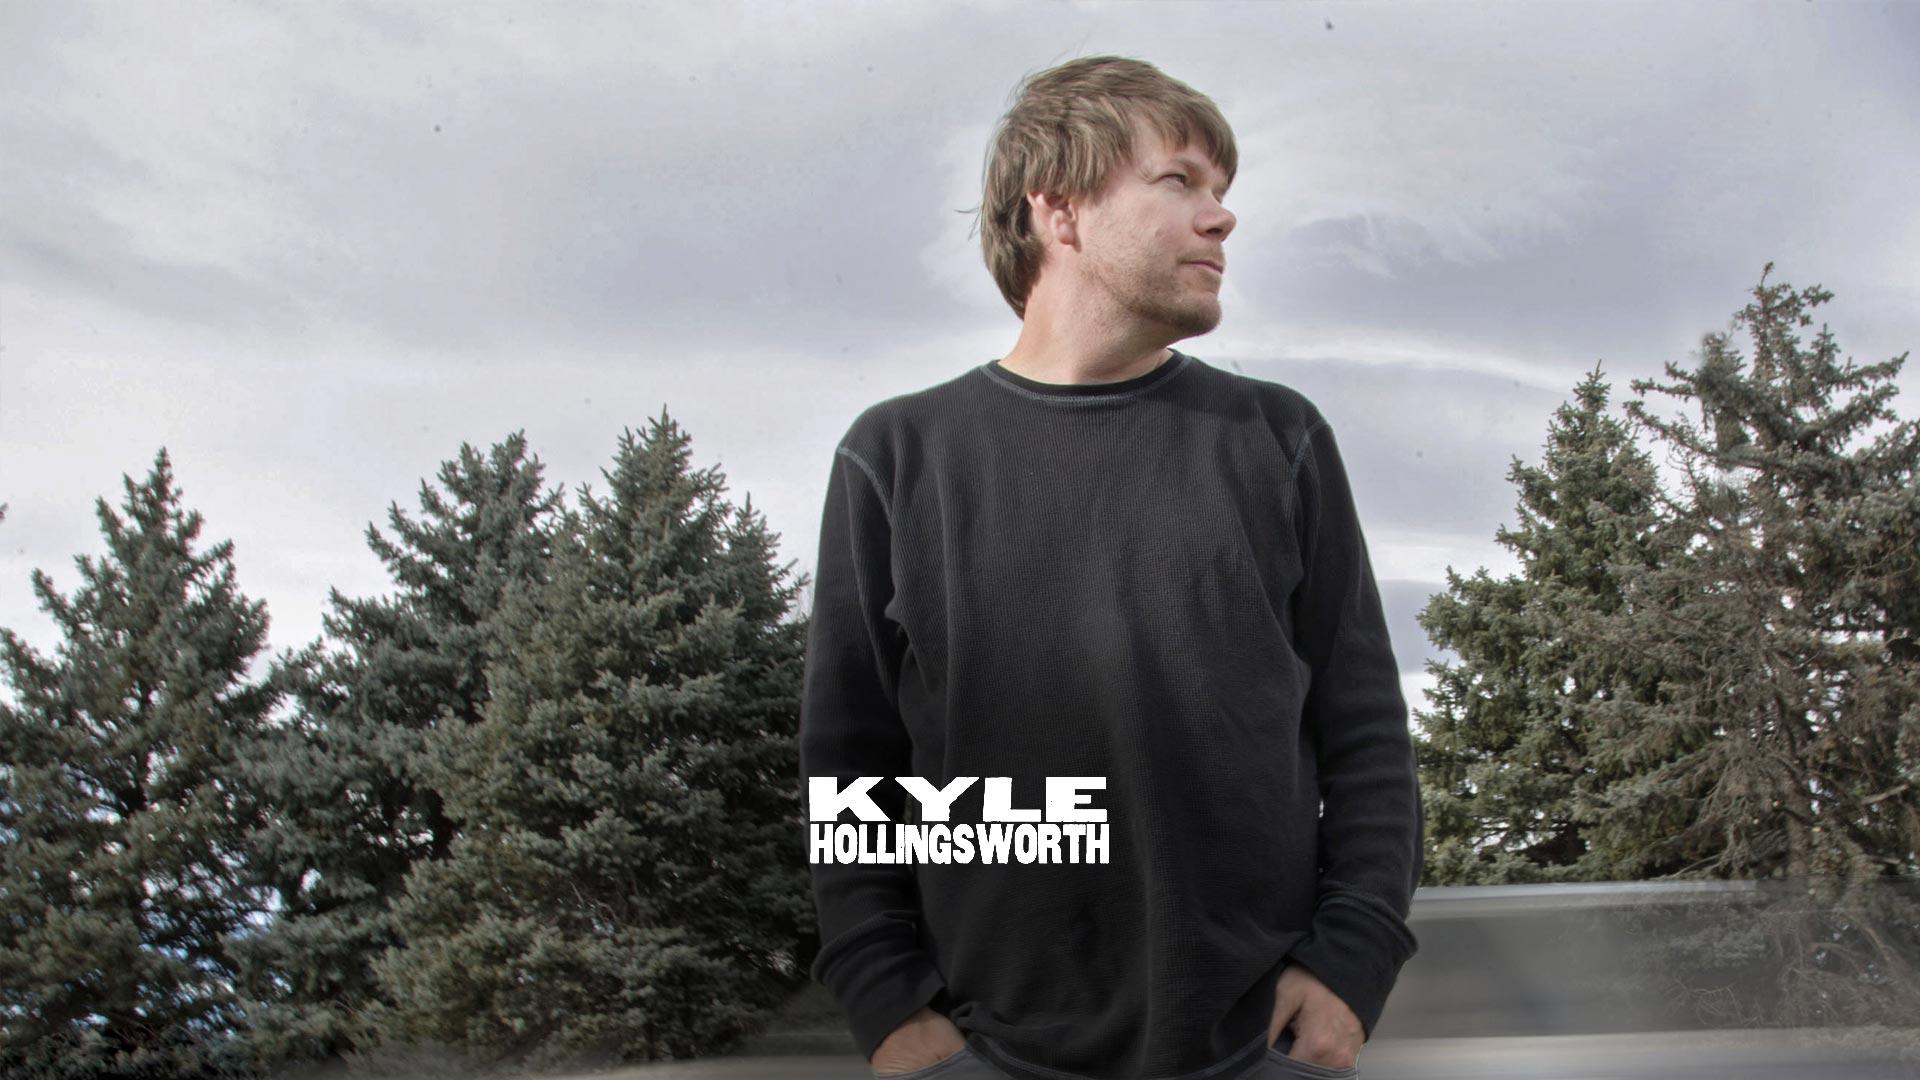 Kyle Hollingsworth